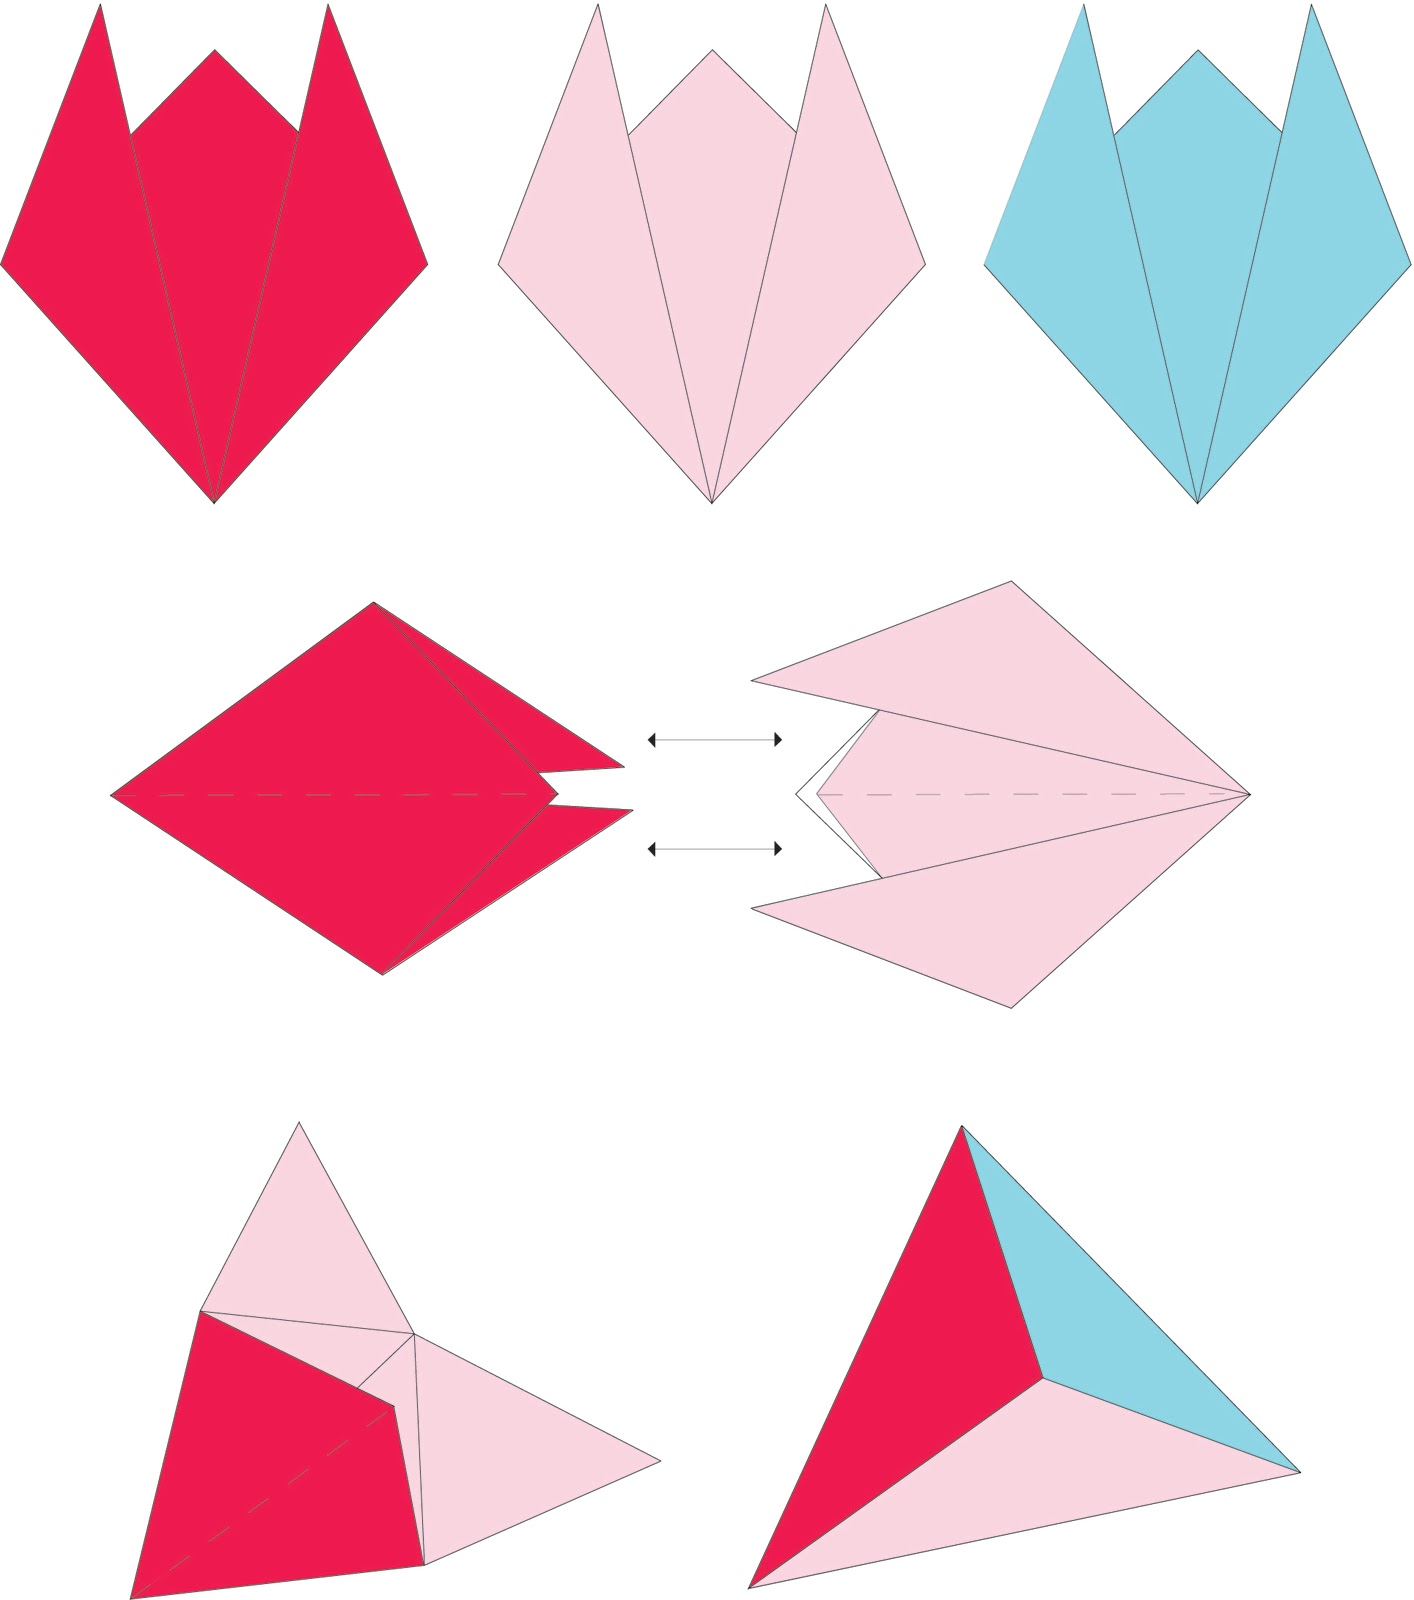 Småkompisar: Make an Origami Box for Small Gifts like ... - photo#3